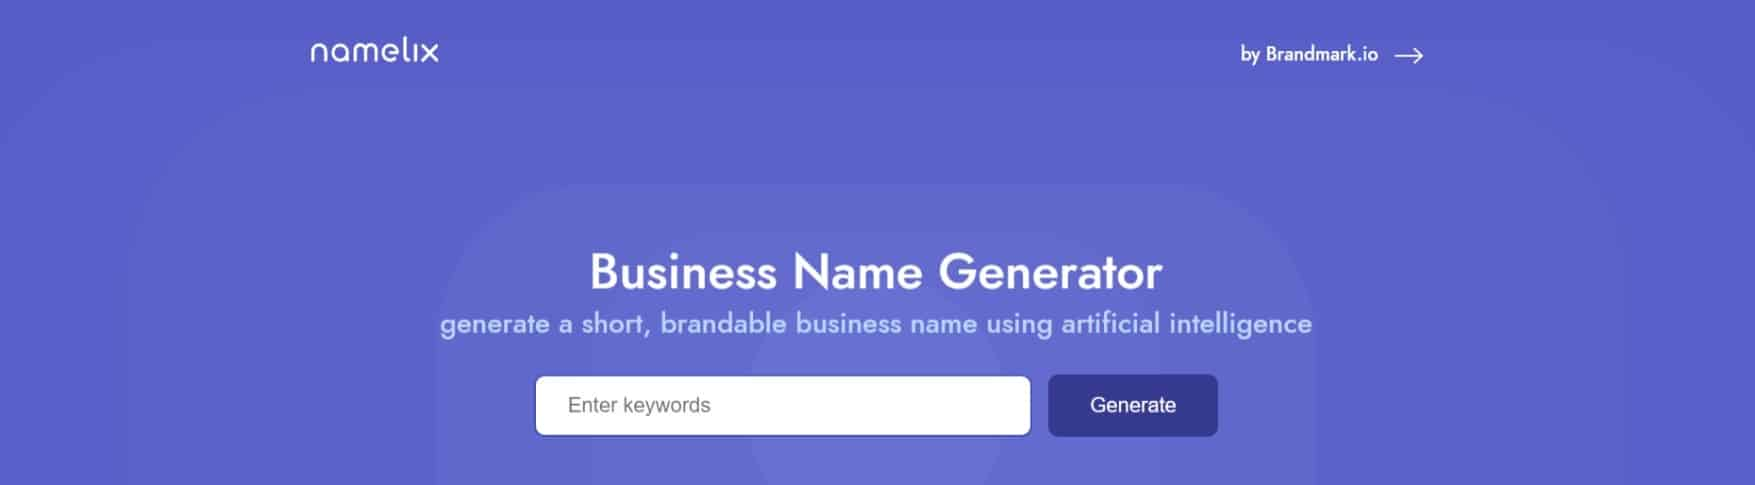 Namelix: Business Name Generator – free AI-powered naming tool